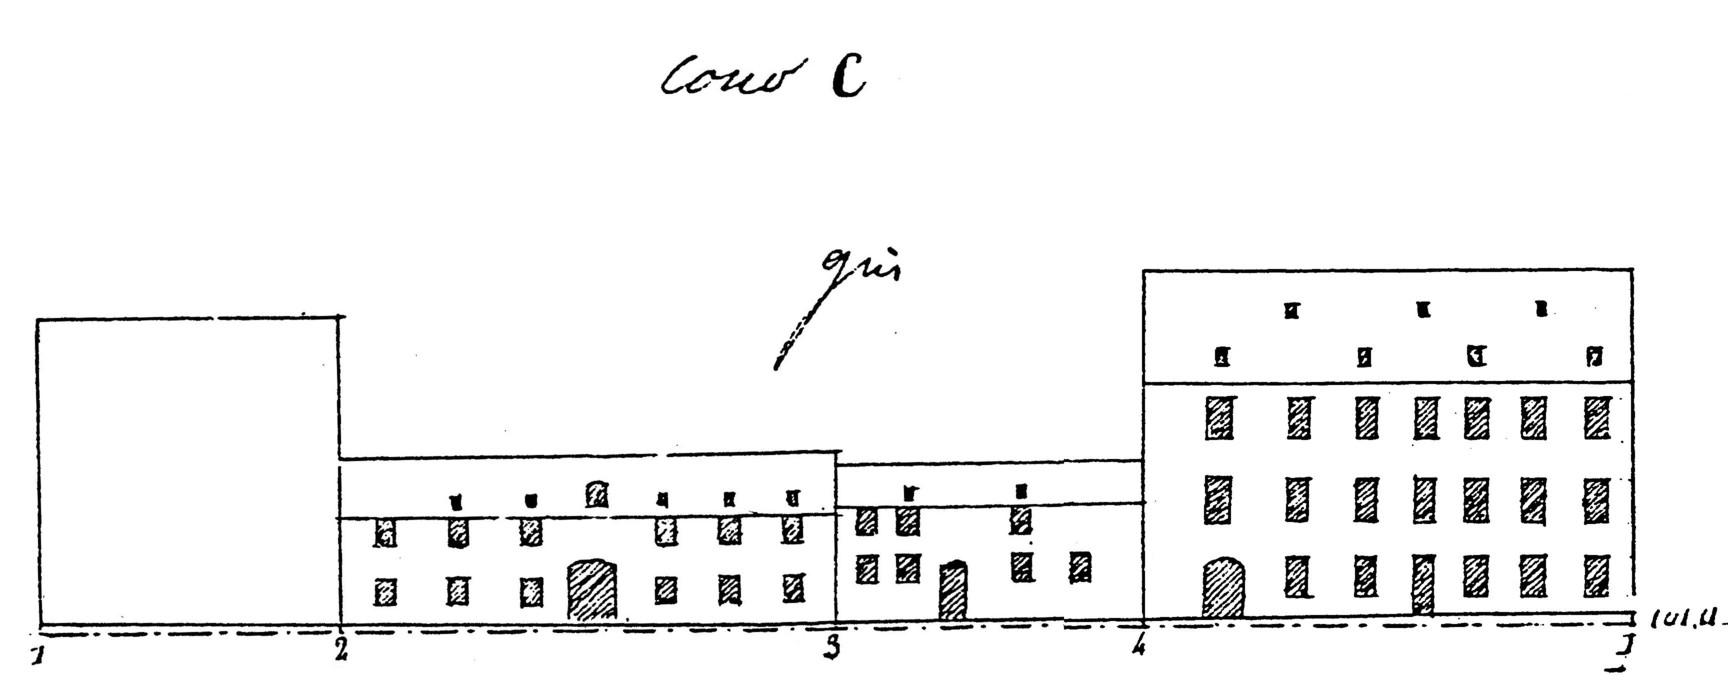 wohnstuben gestaltung : Maisons De Strasbourg R Sultats De Recherche Ehrmann